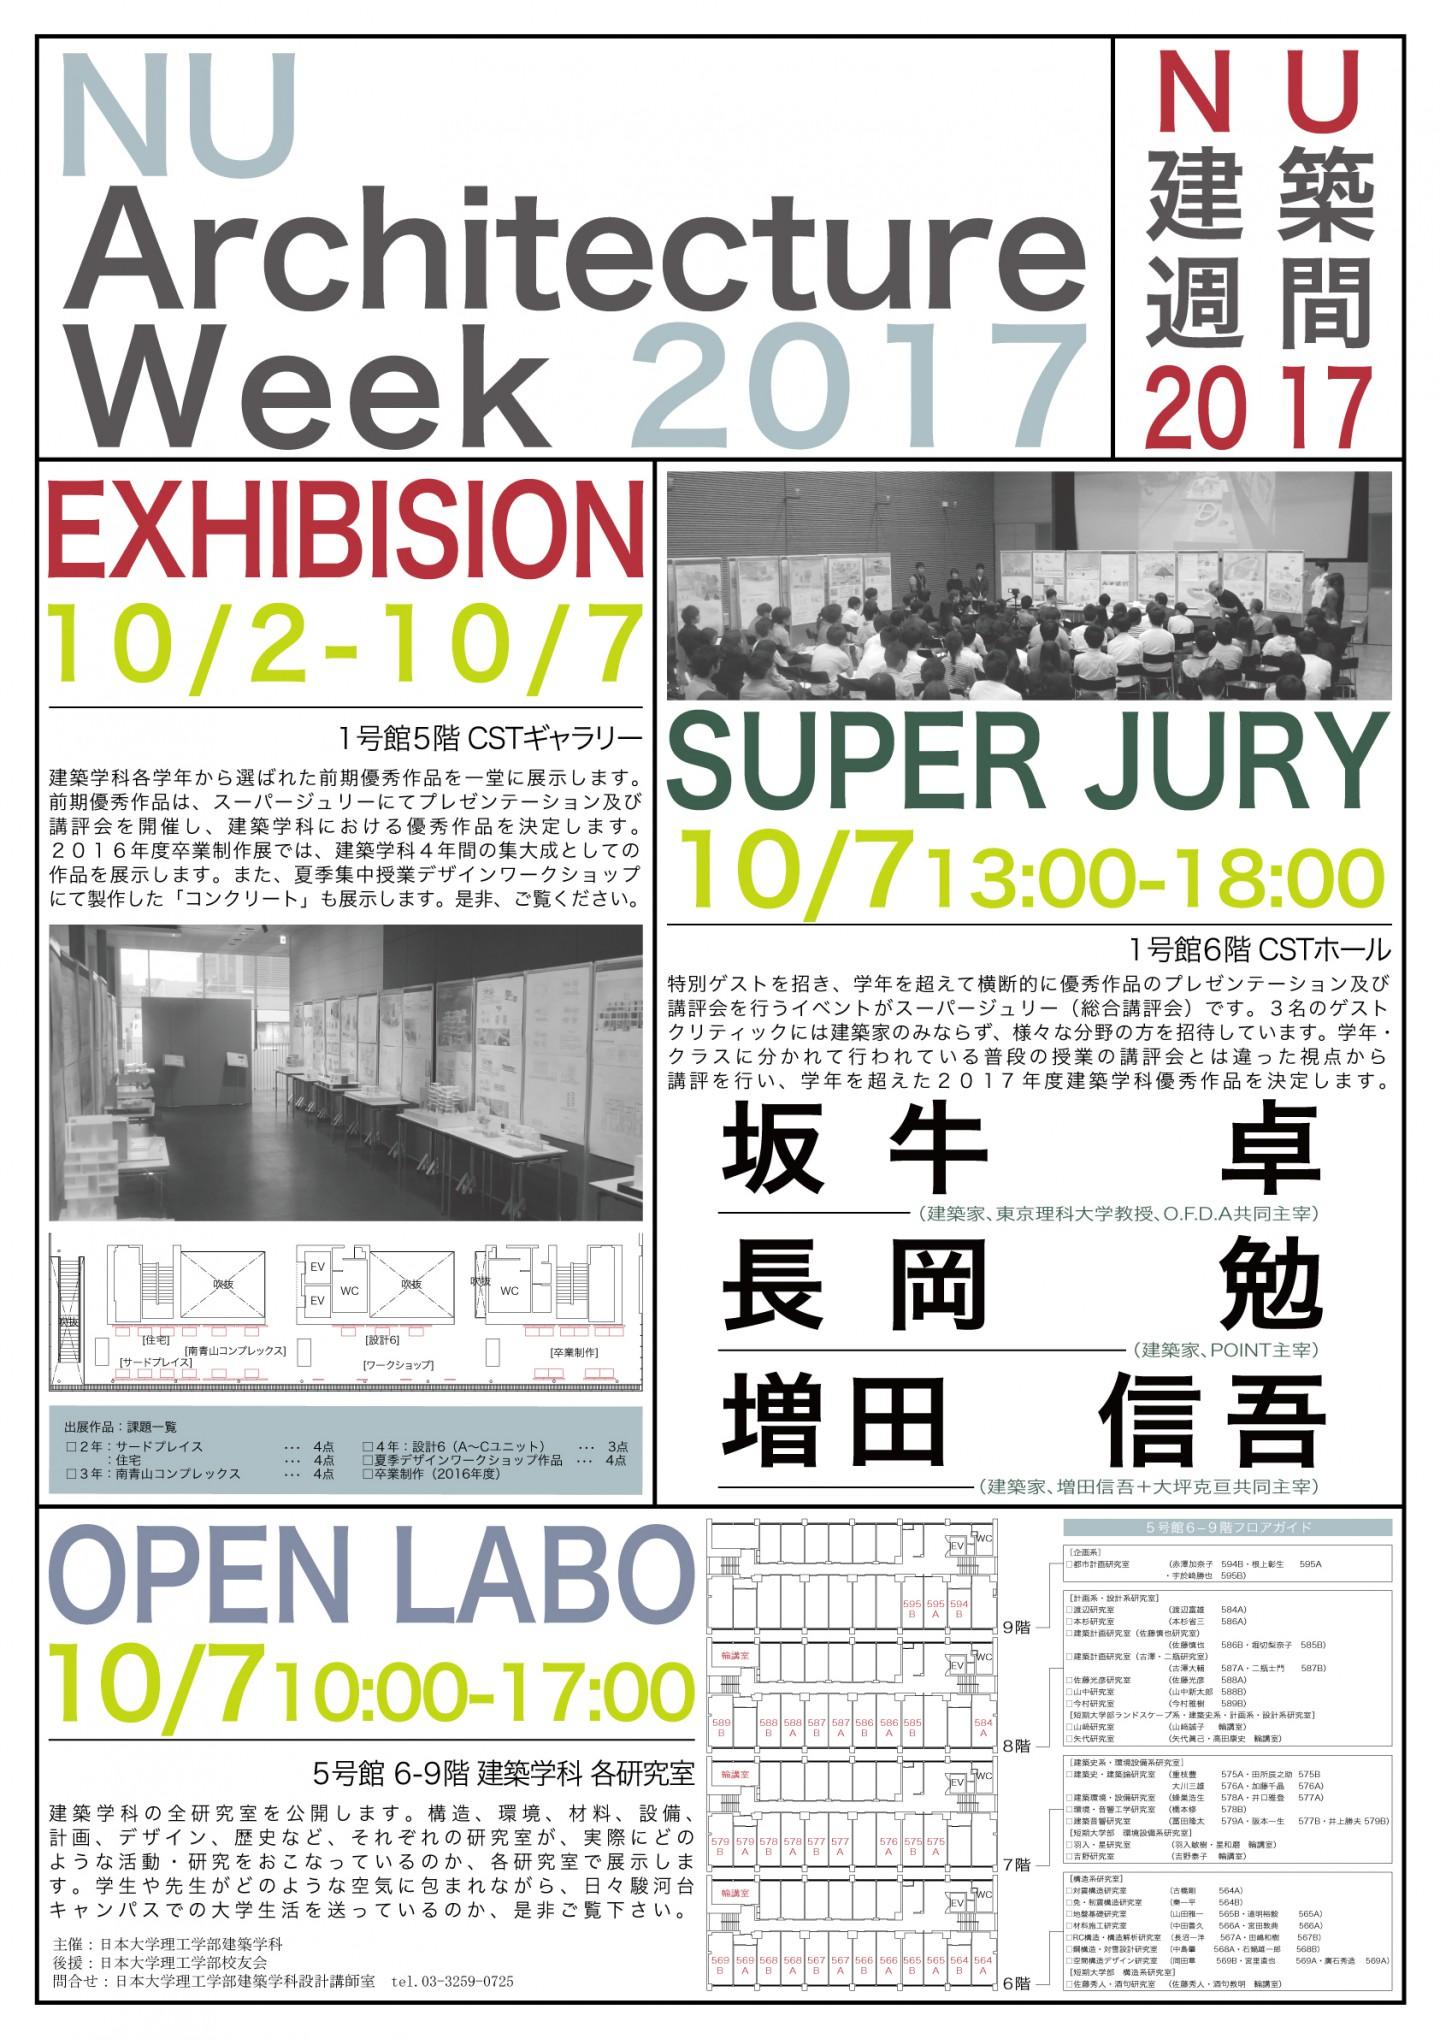 2017NU_poster